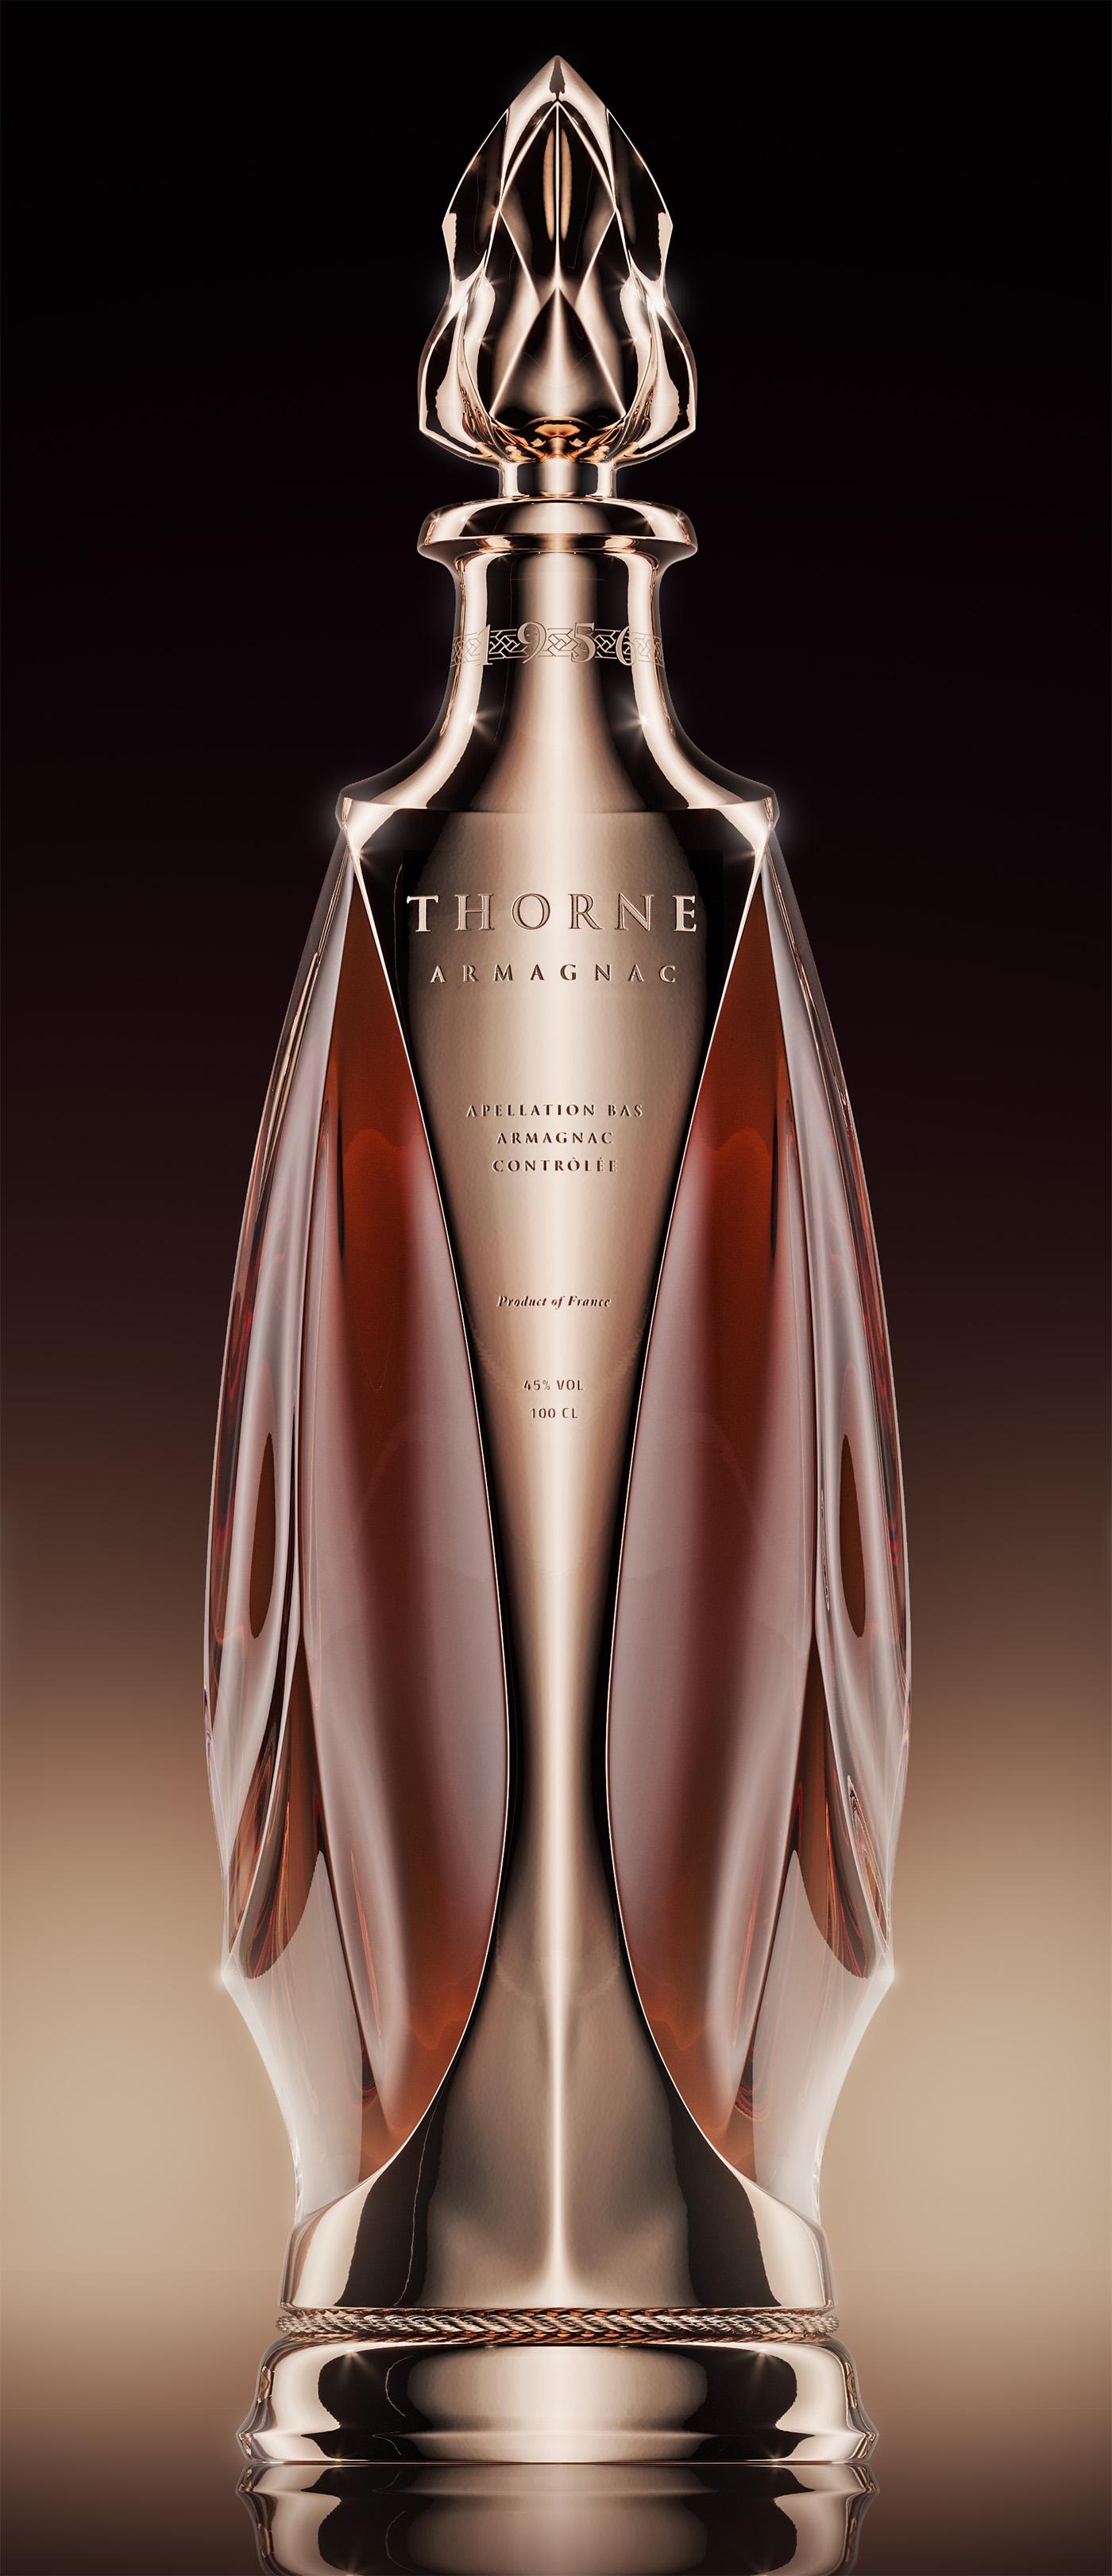 Thorne luxury armagnac bottle 2.jpg